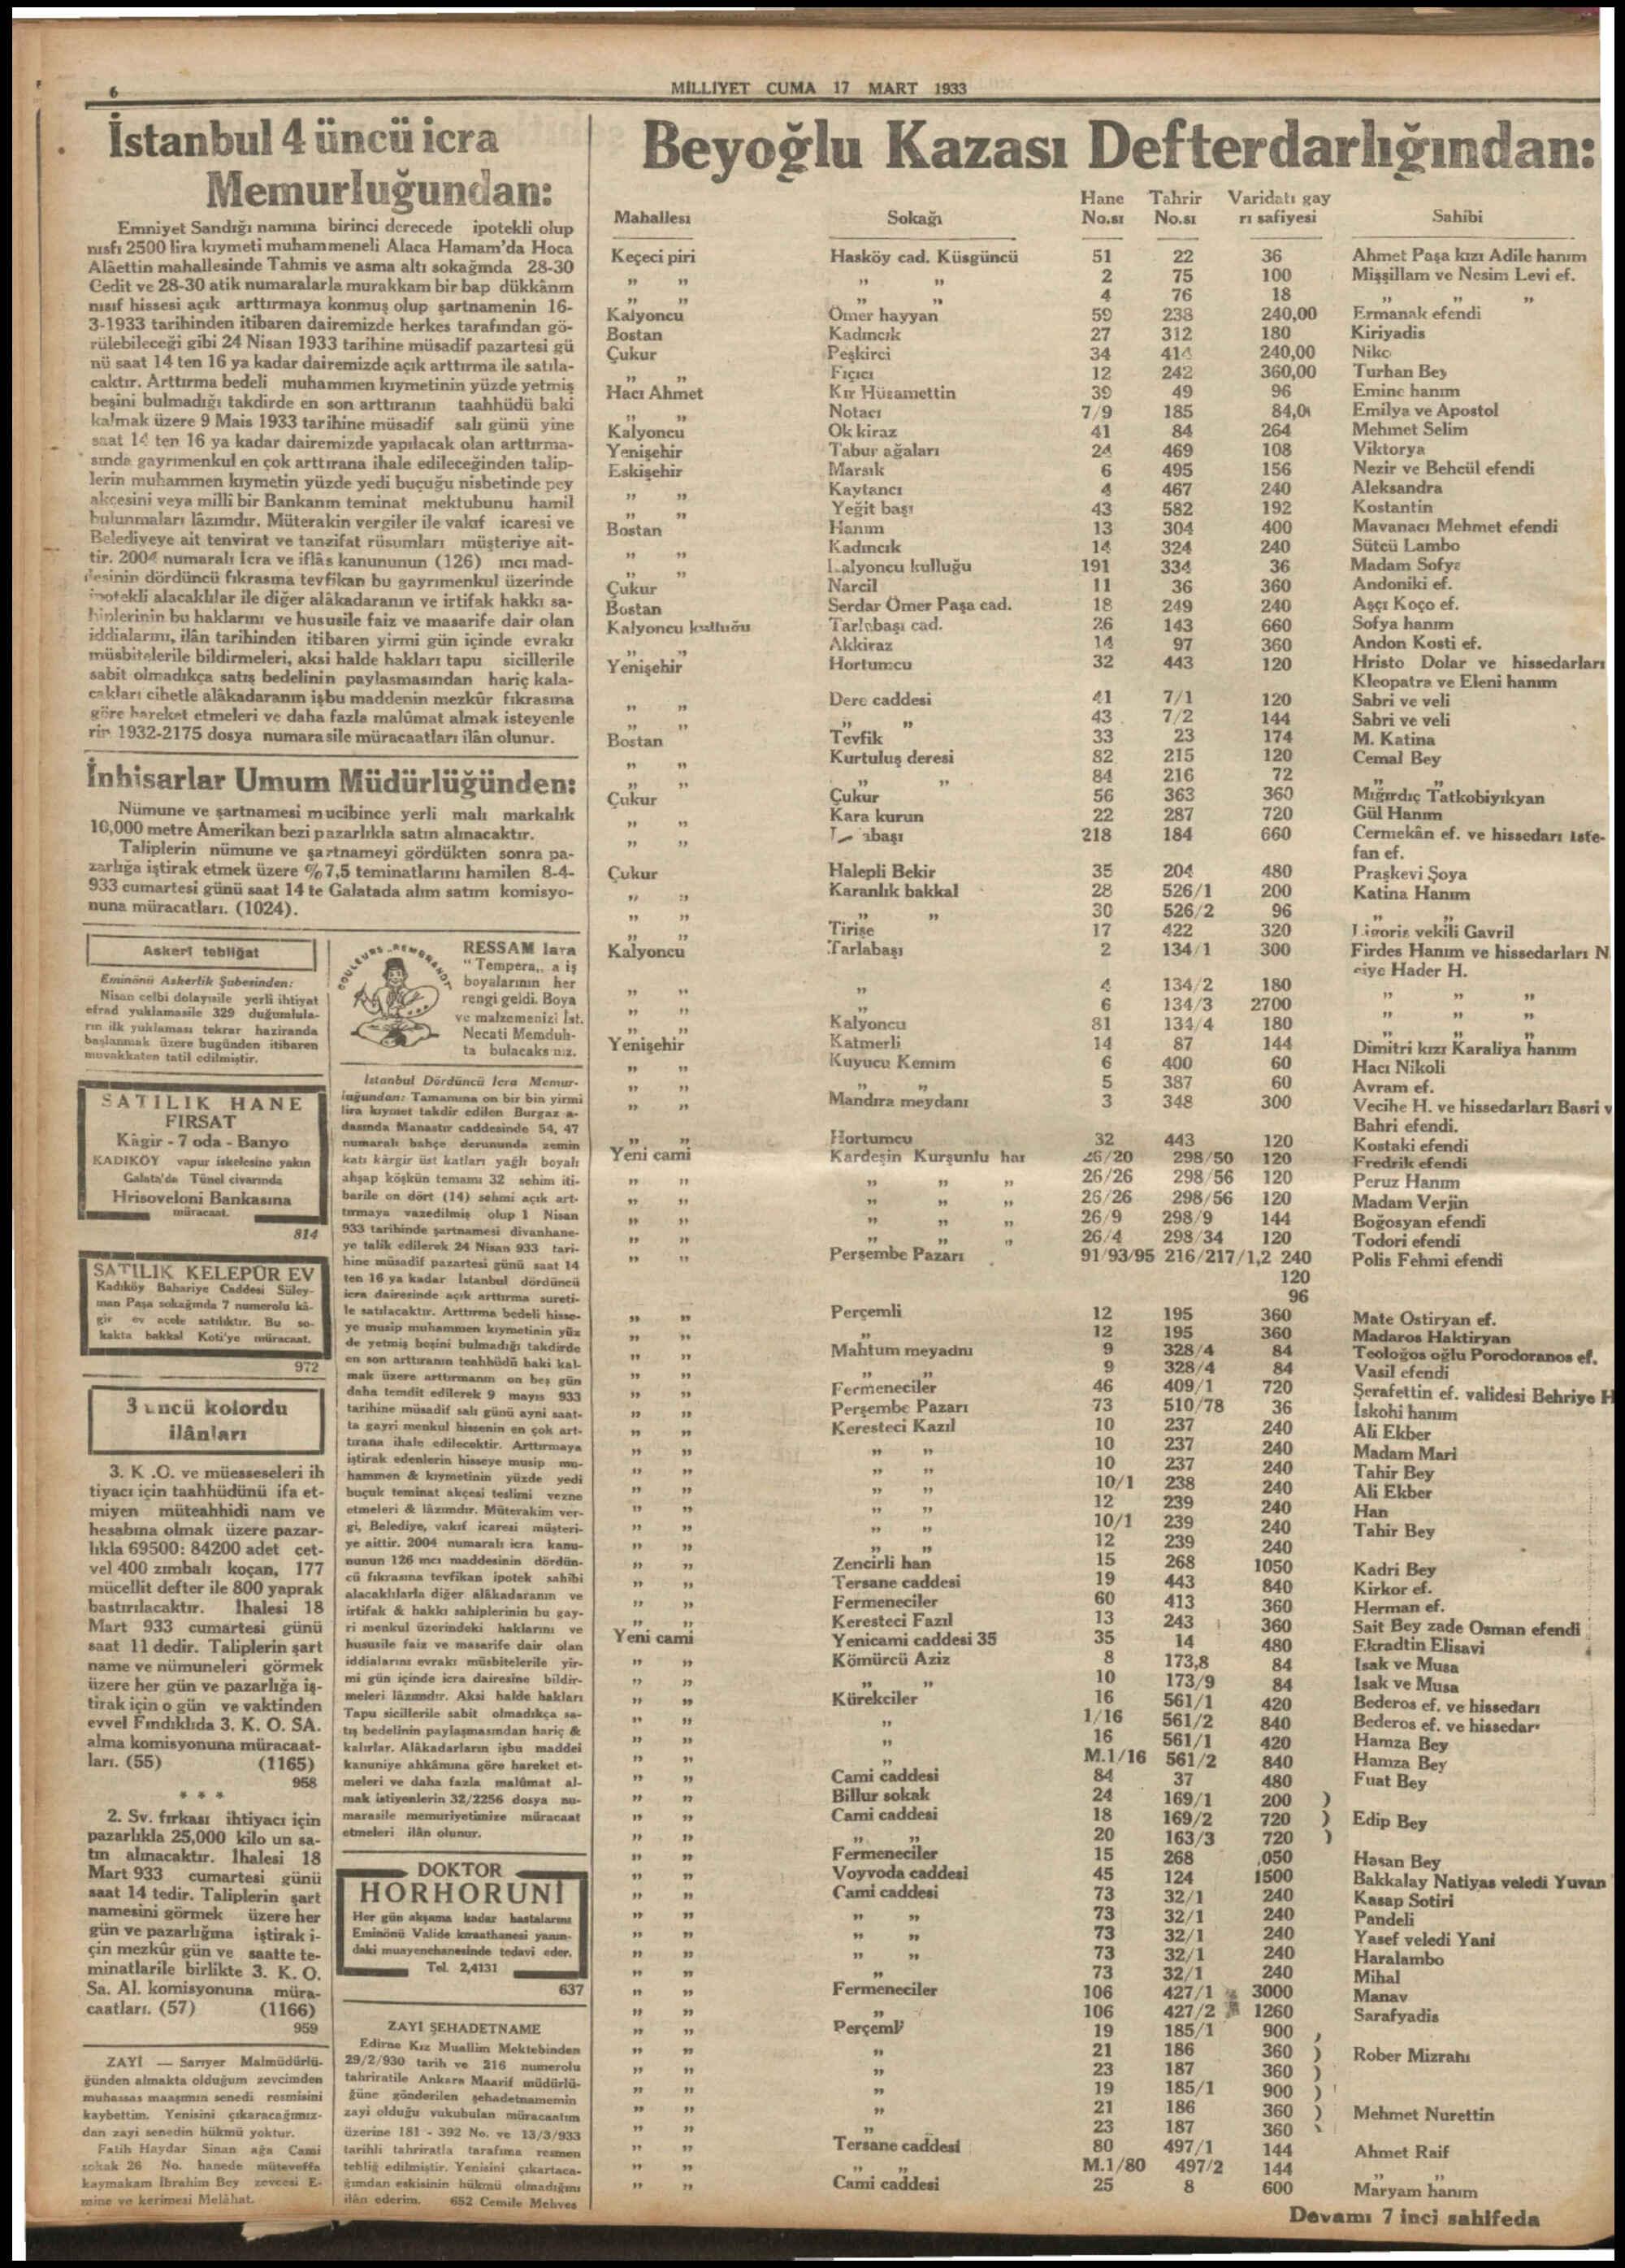 17 Mart 1933 Tarihli Milliyet Gazetesi Sayfa 6